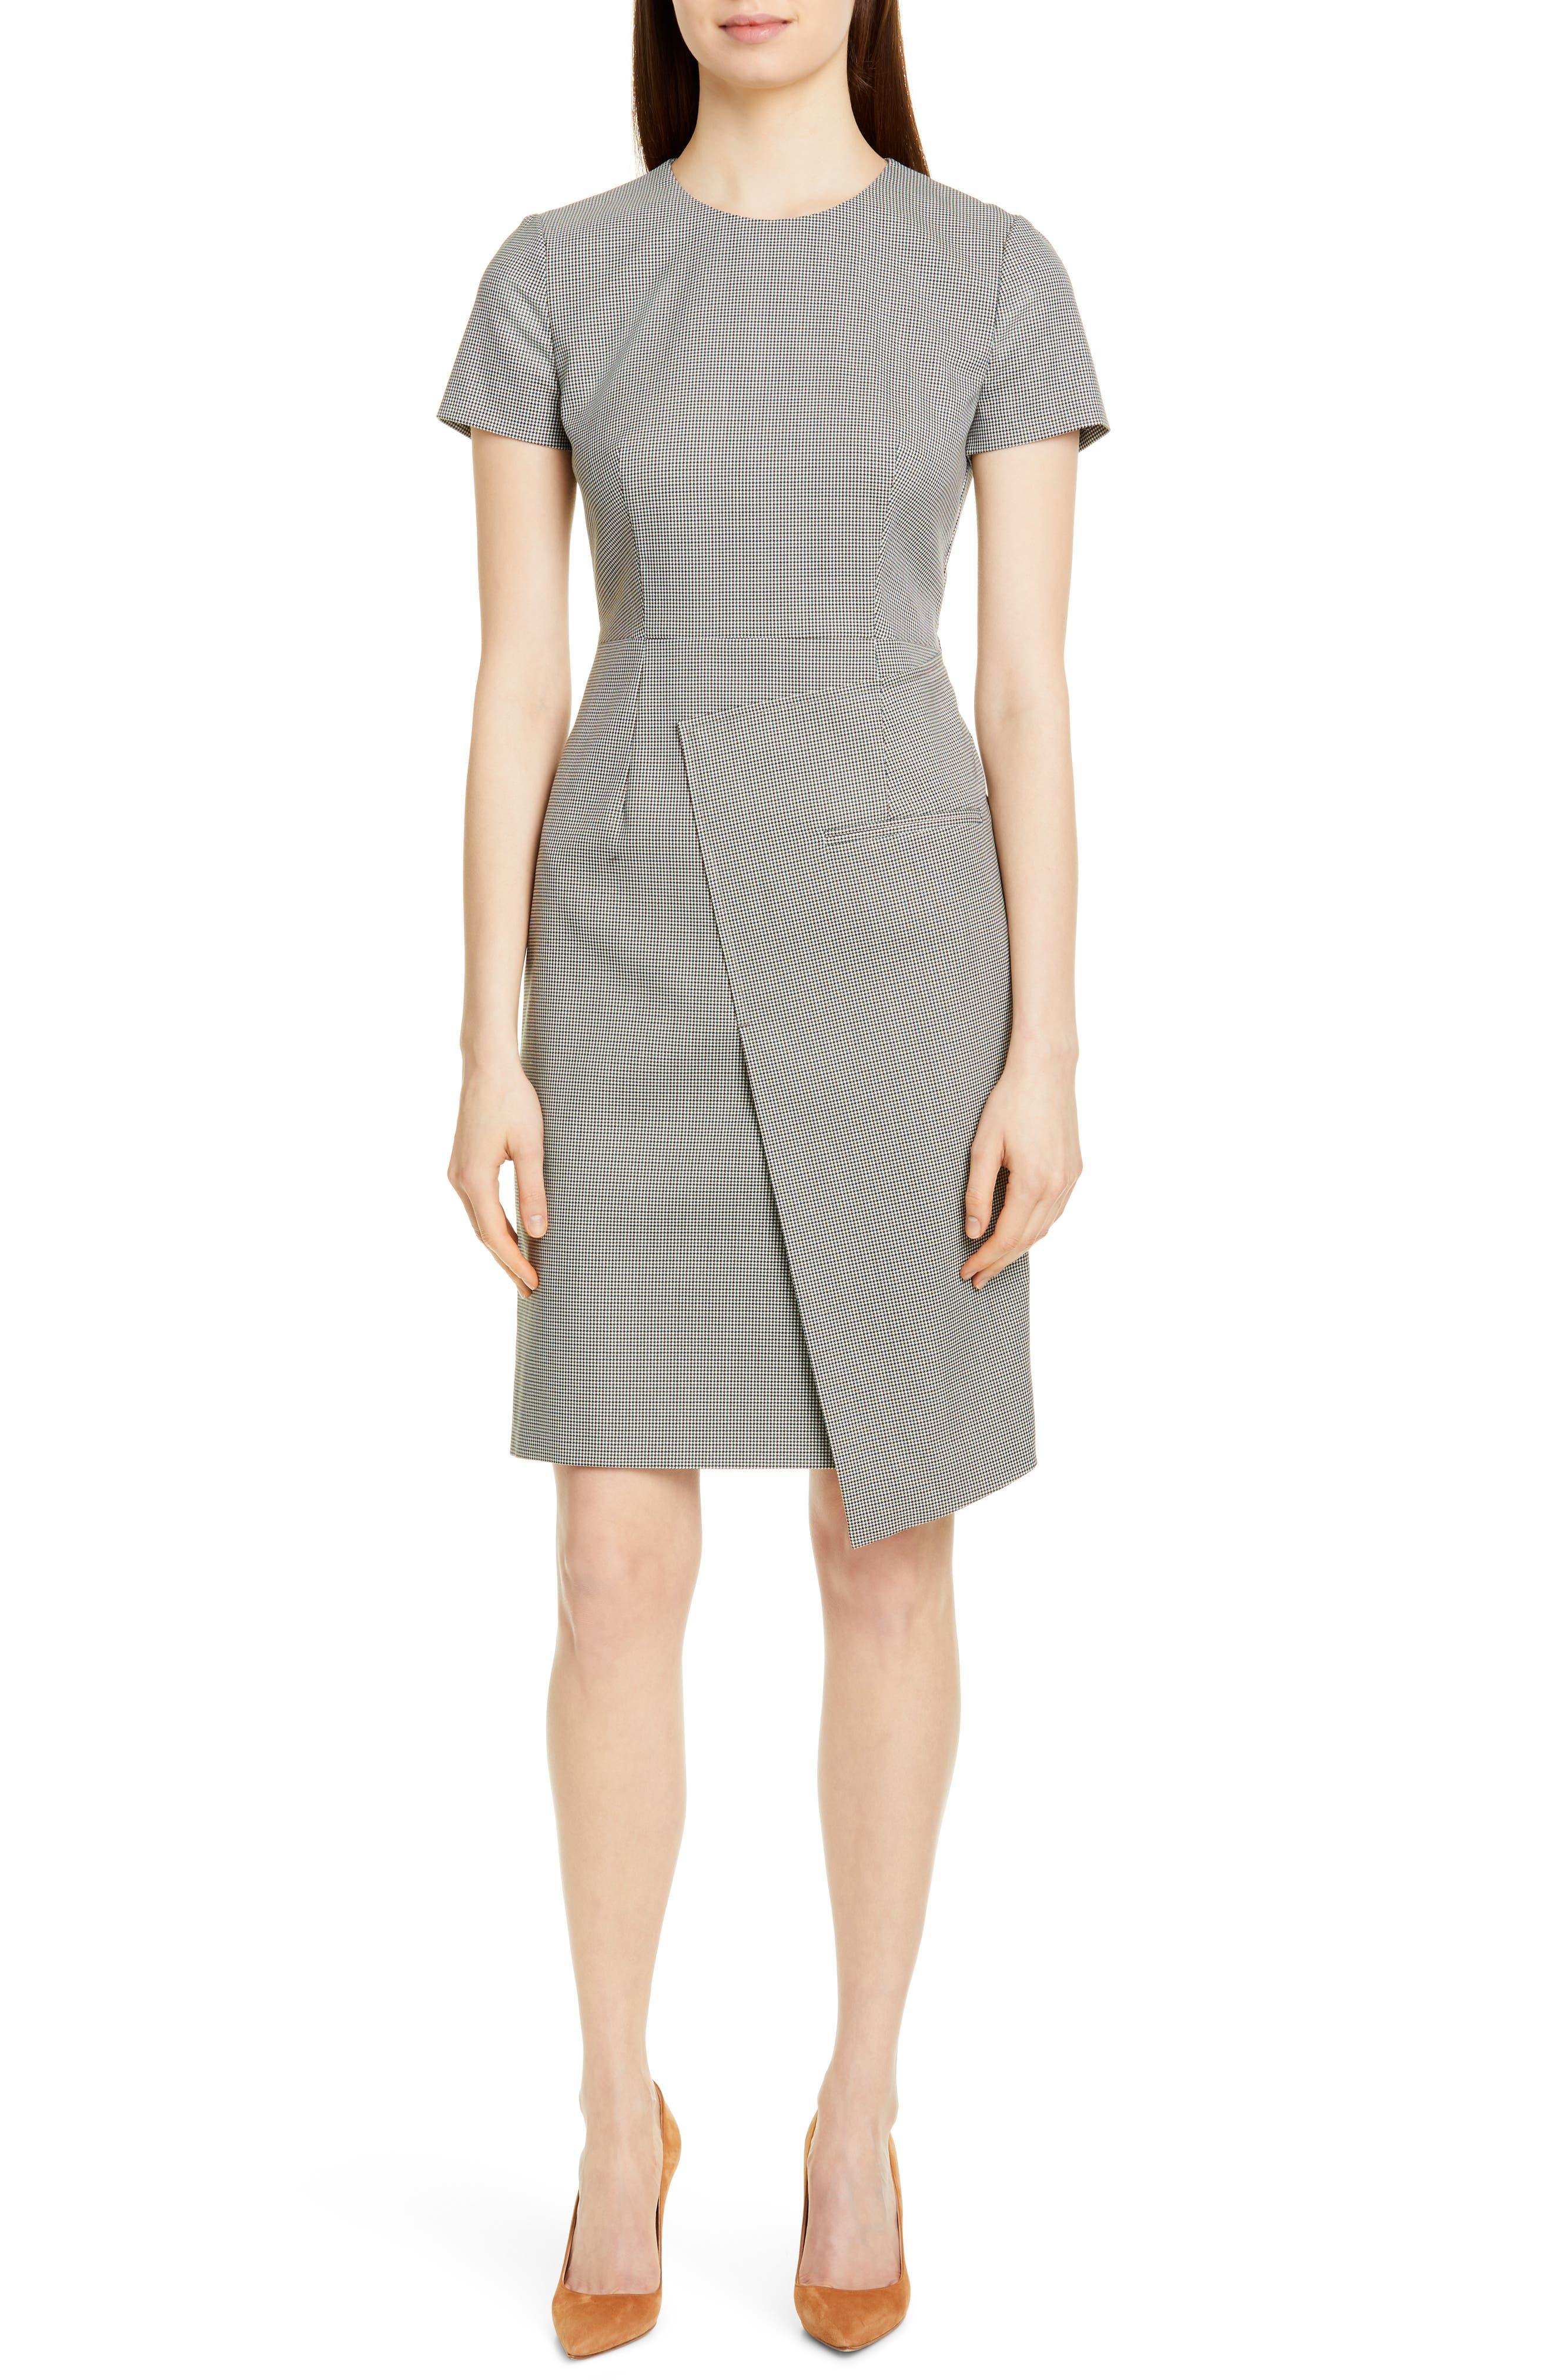 Petite Boss Dureta Mini Houndstooth Sheath Dress, P - Green